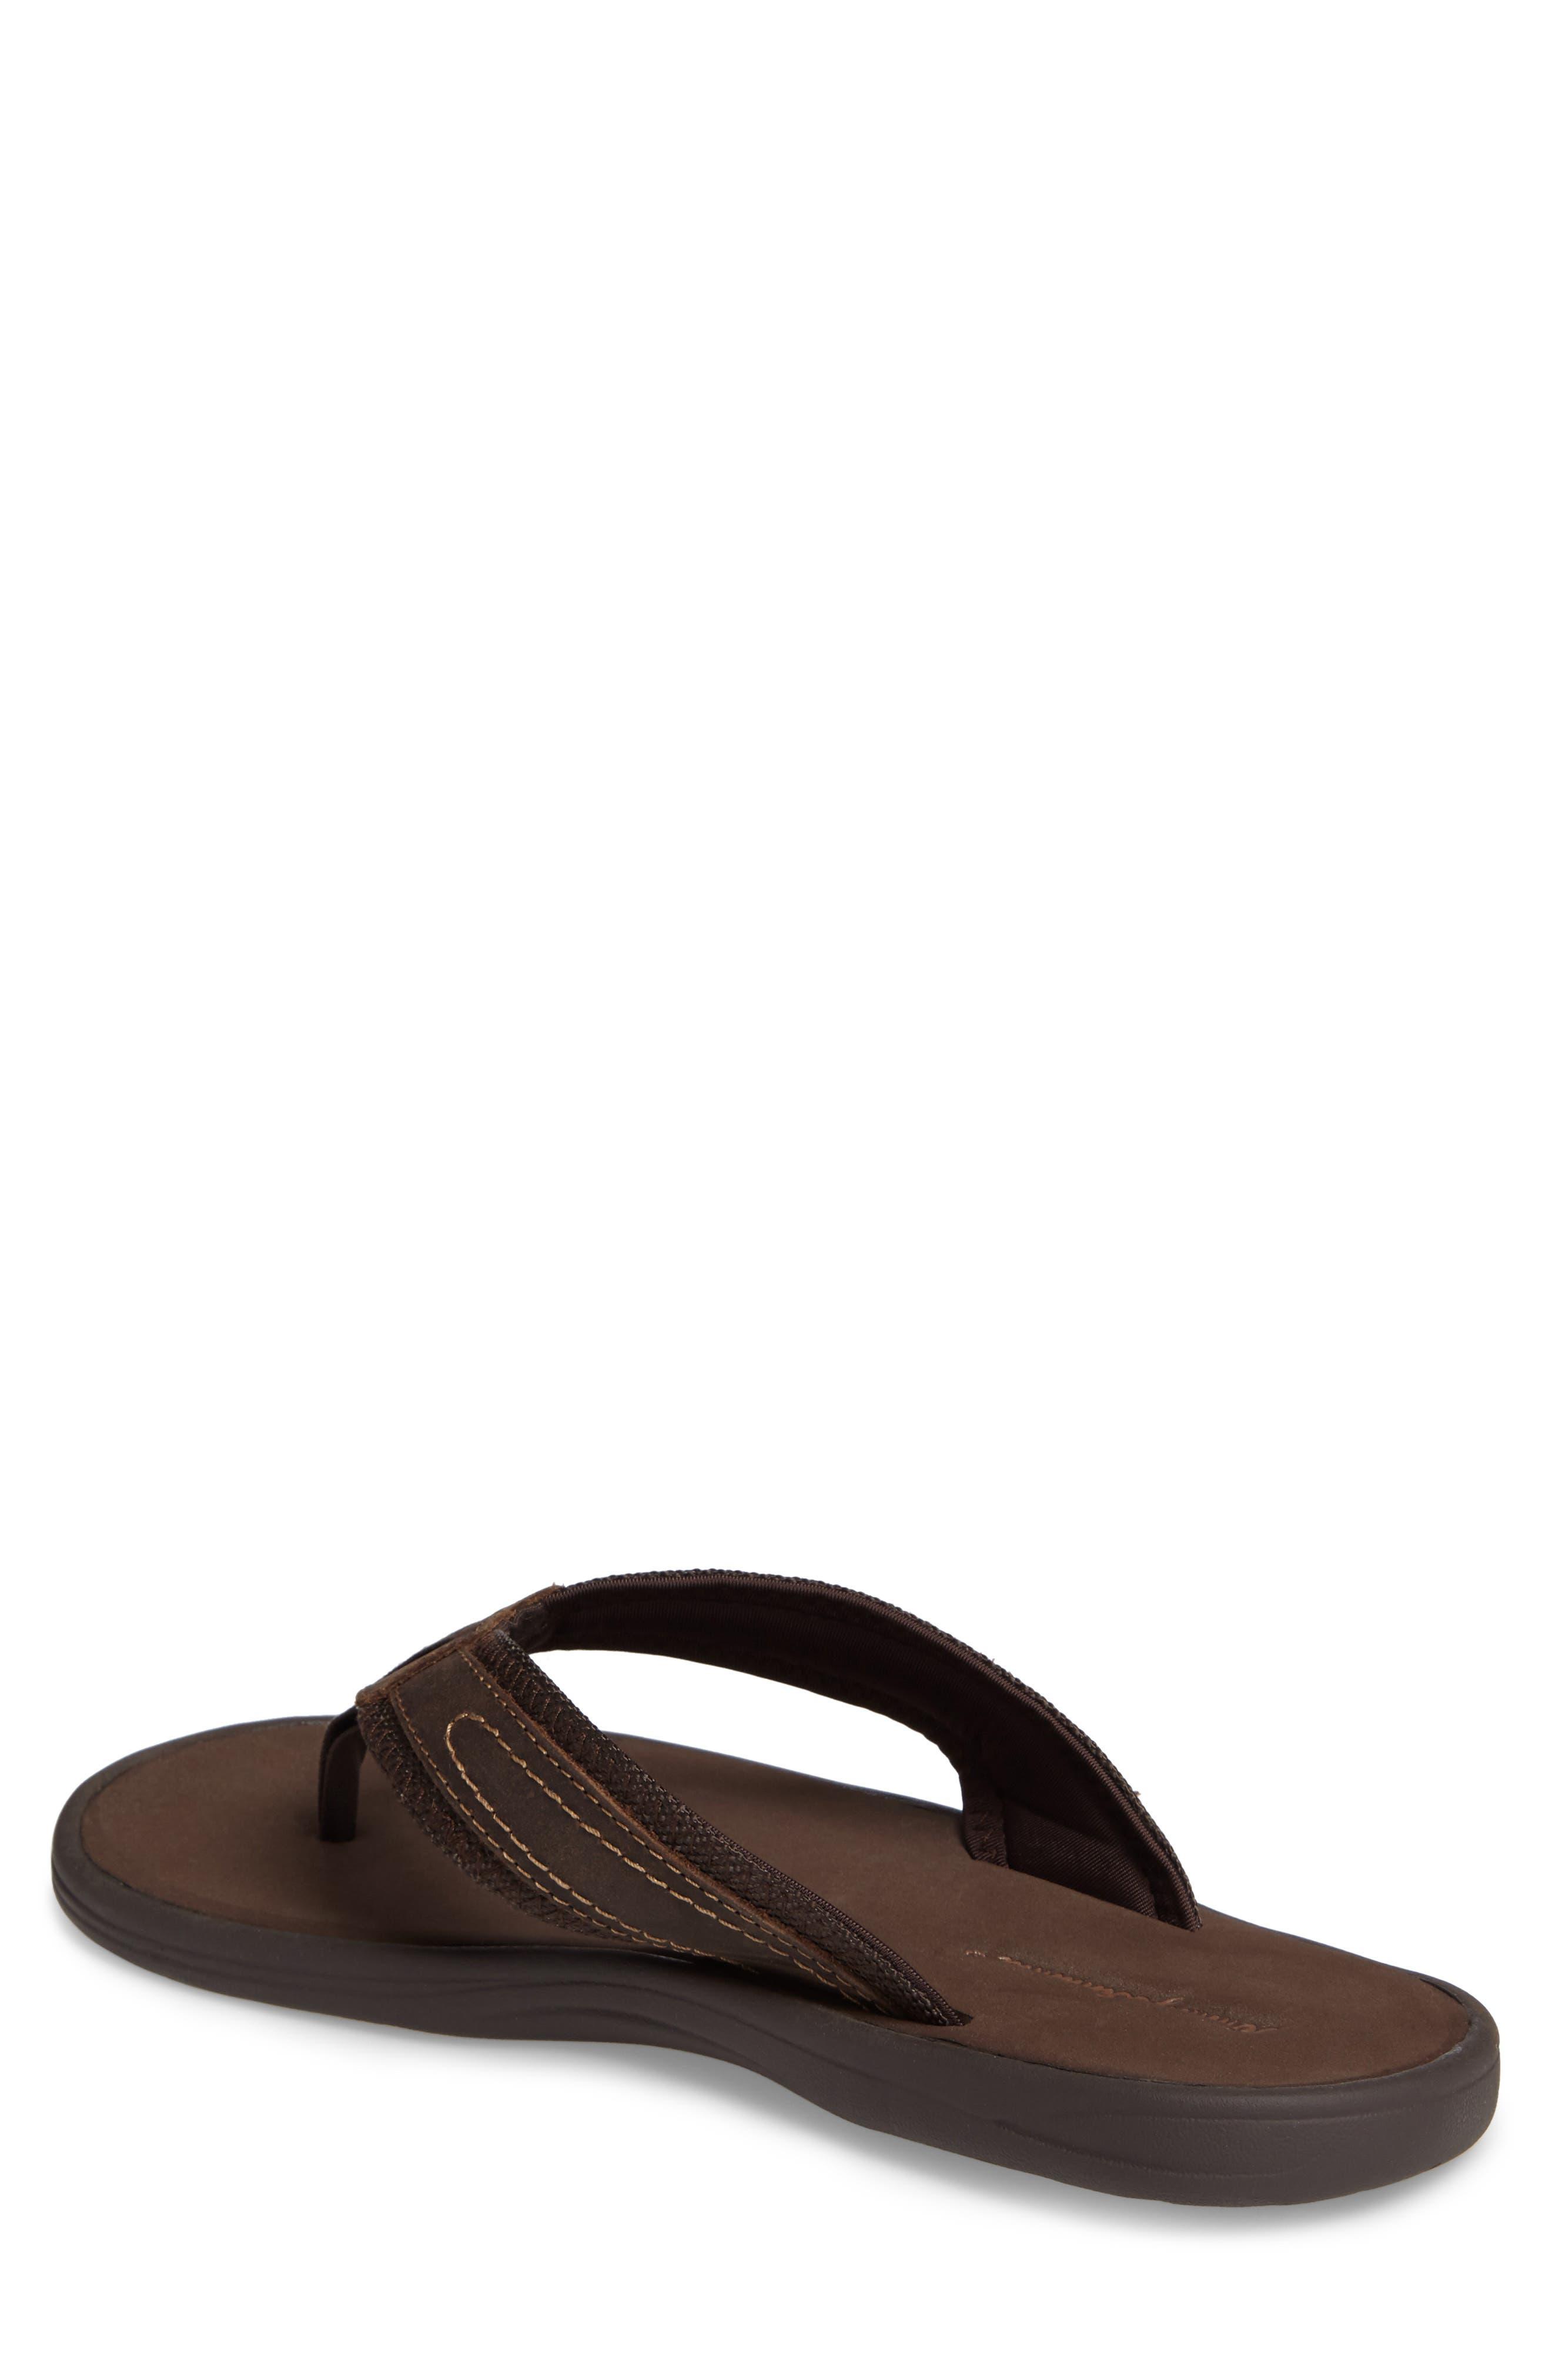 Seawell Flip Flop,                             Alternate thumbnail 2, color,                             Dark Brown Leather